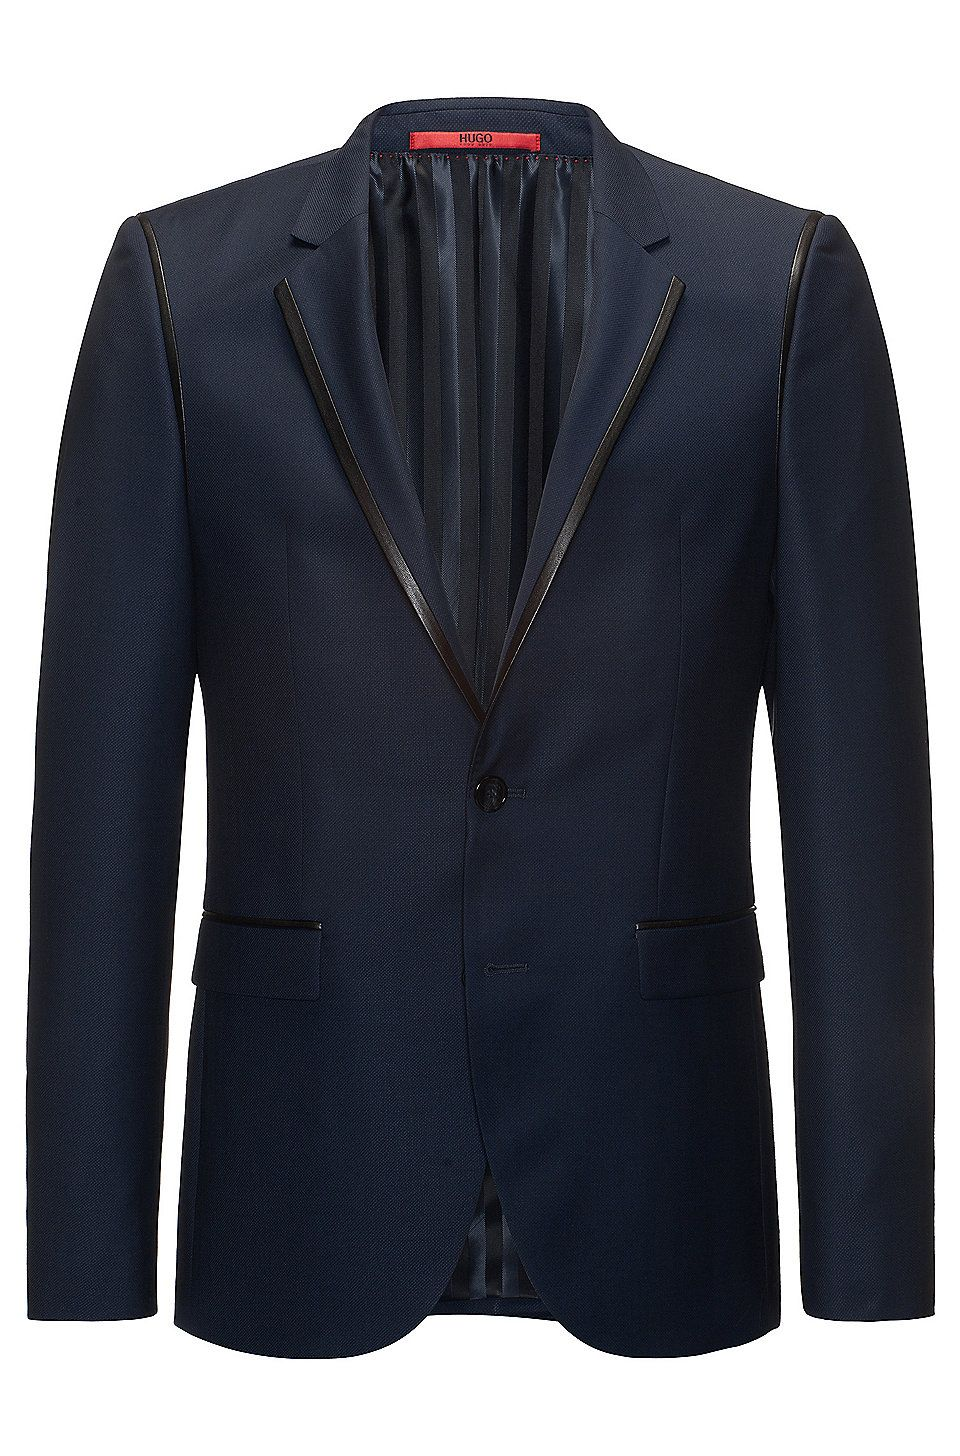 LeatherTrim Wool Sport Coat, Extra Slim Fit Arwet Dark